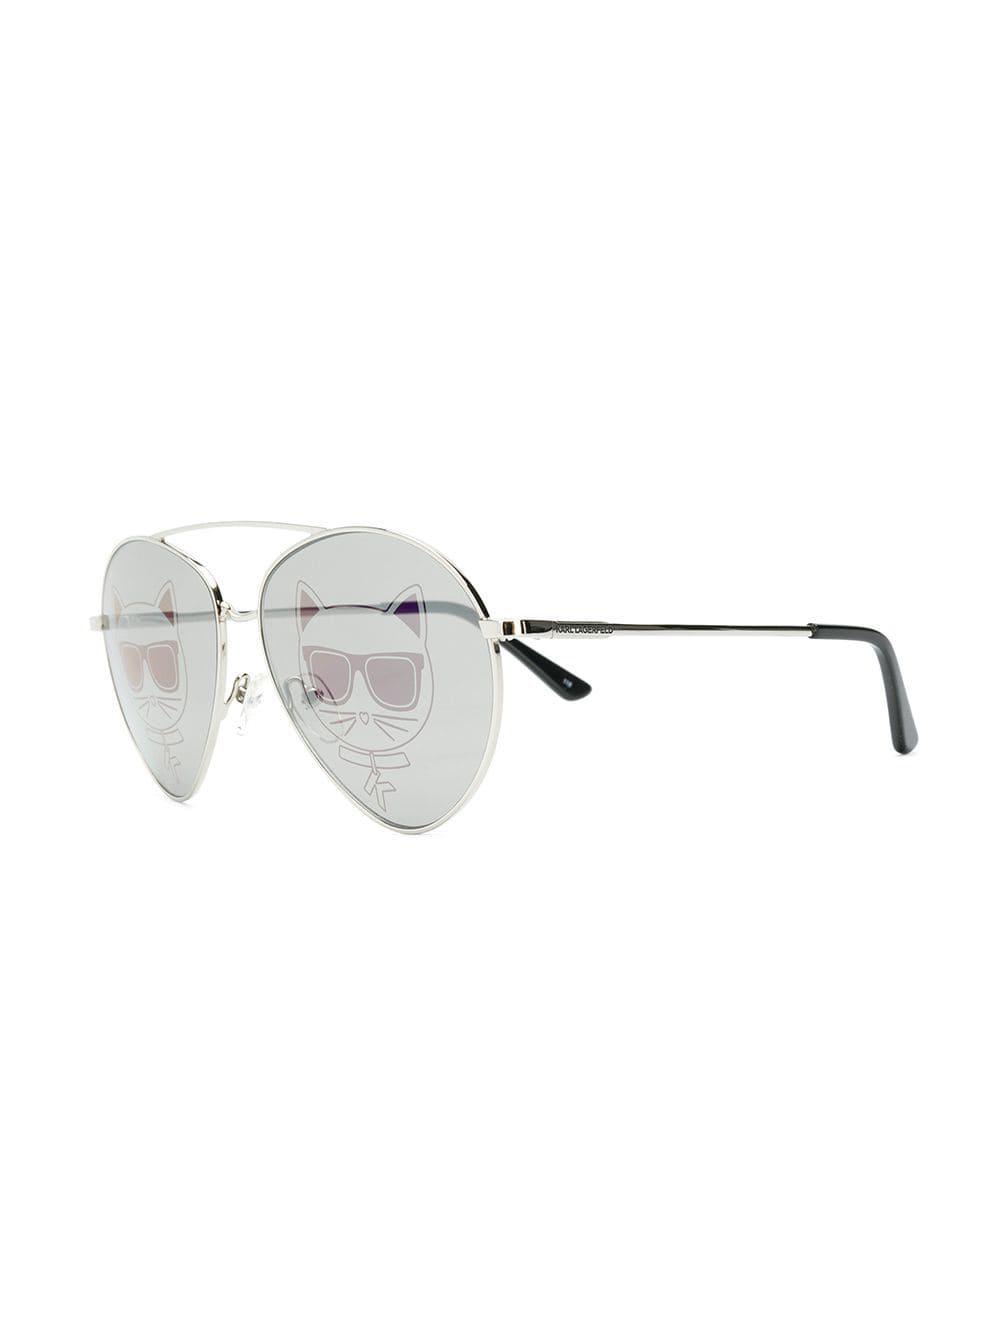 5d1f33442ef0 Karl Lagerfeld Kreative Sunglasses in Metallic - Lyst